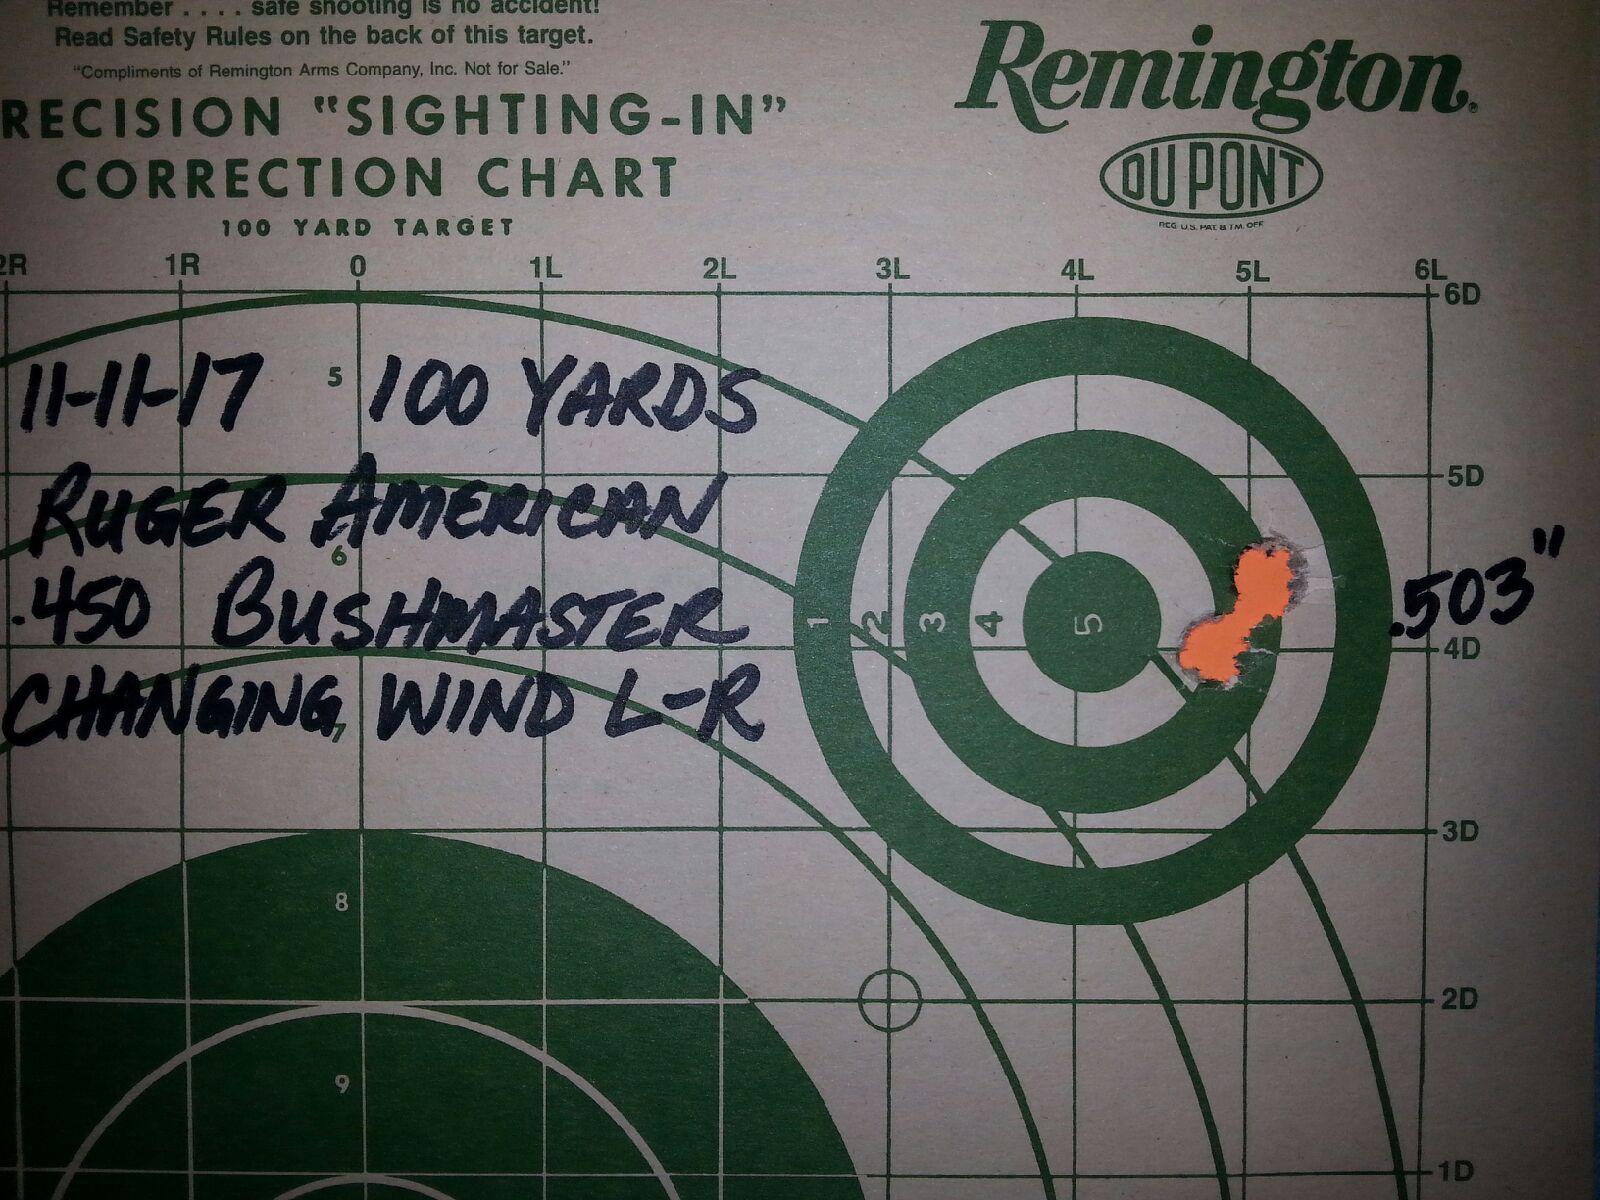 Reloading 450 bushmaster | Michigan Sportsman - Online